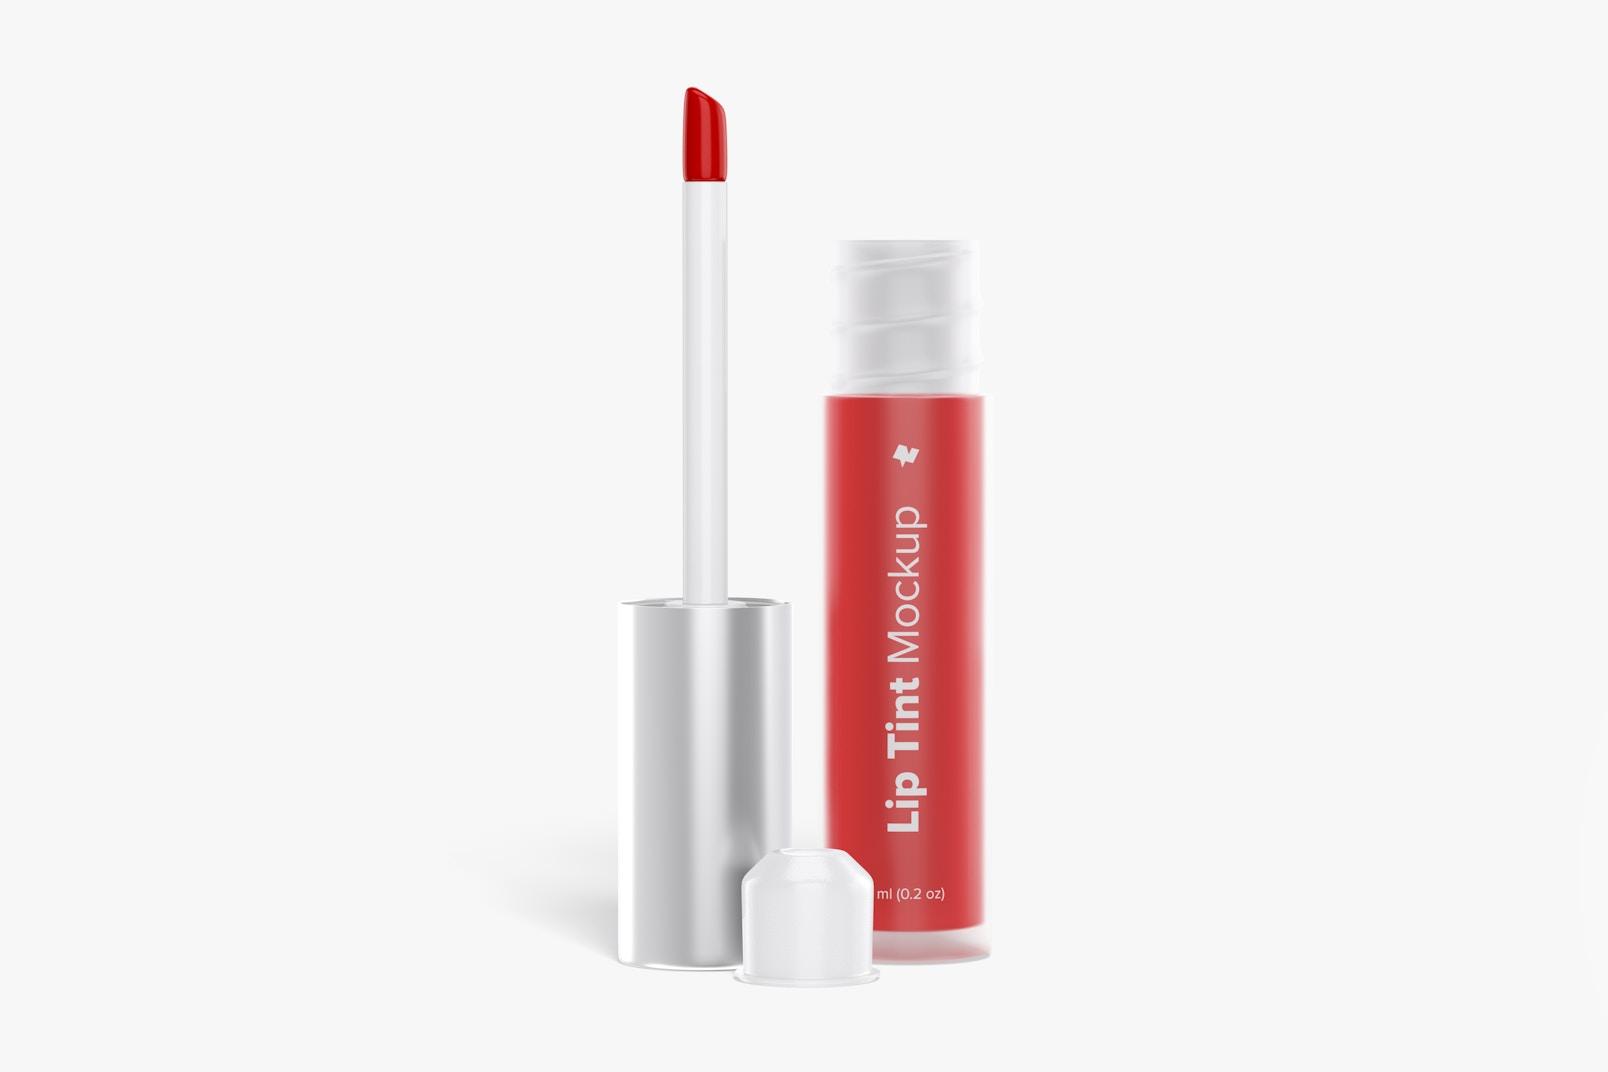 Lip Tint Tube Mockup, Opened